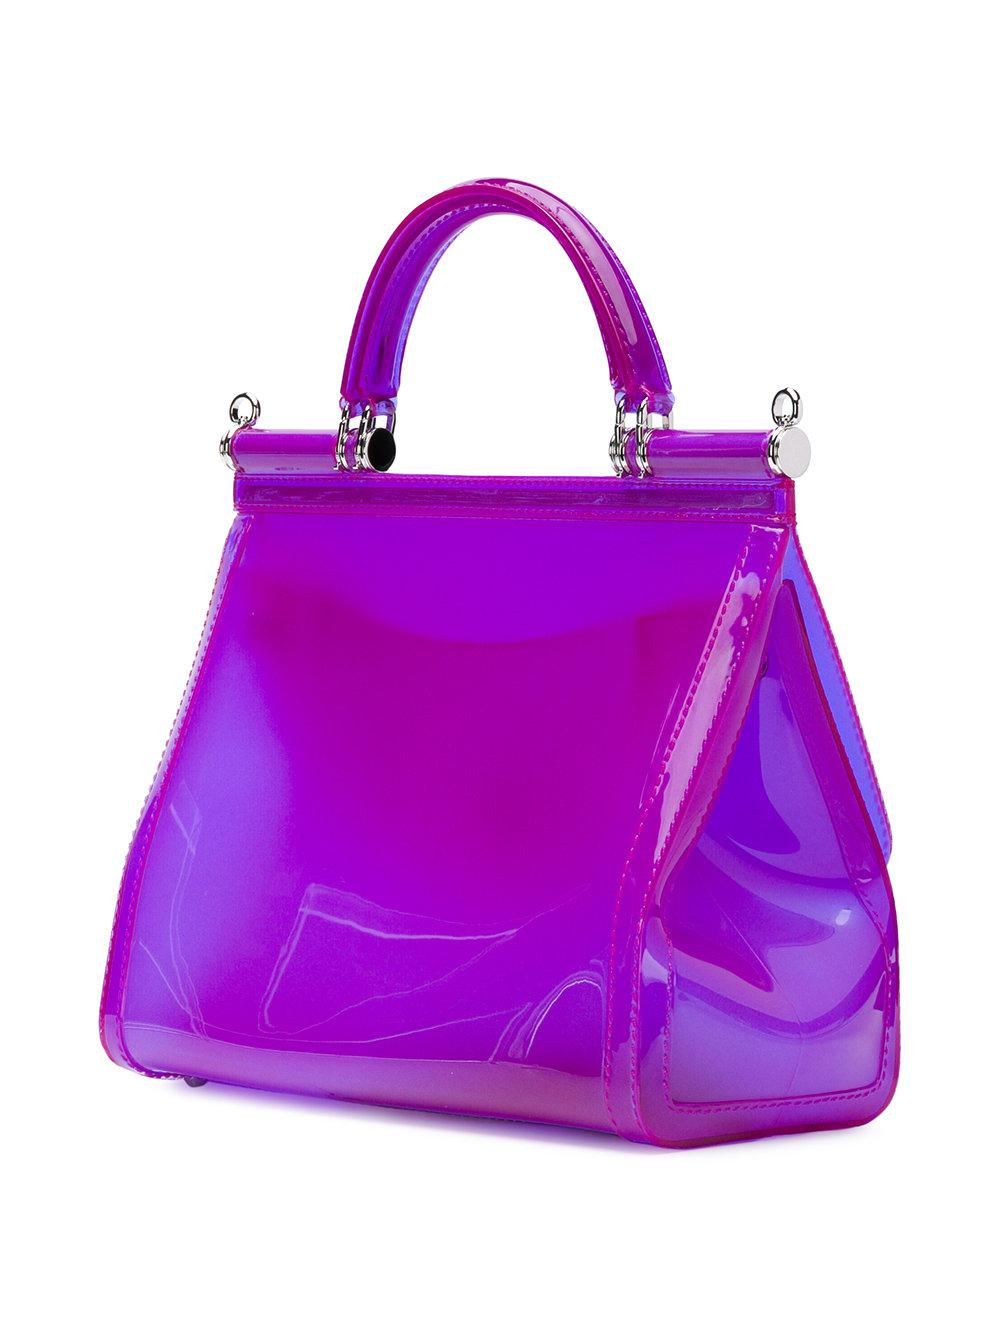 Dolce & Gabbana Lace Sicily Tote Bag in Pink & Purple (Purple)